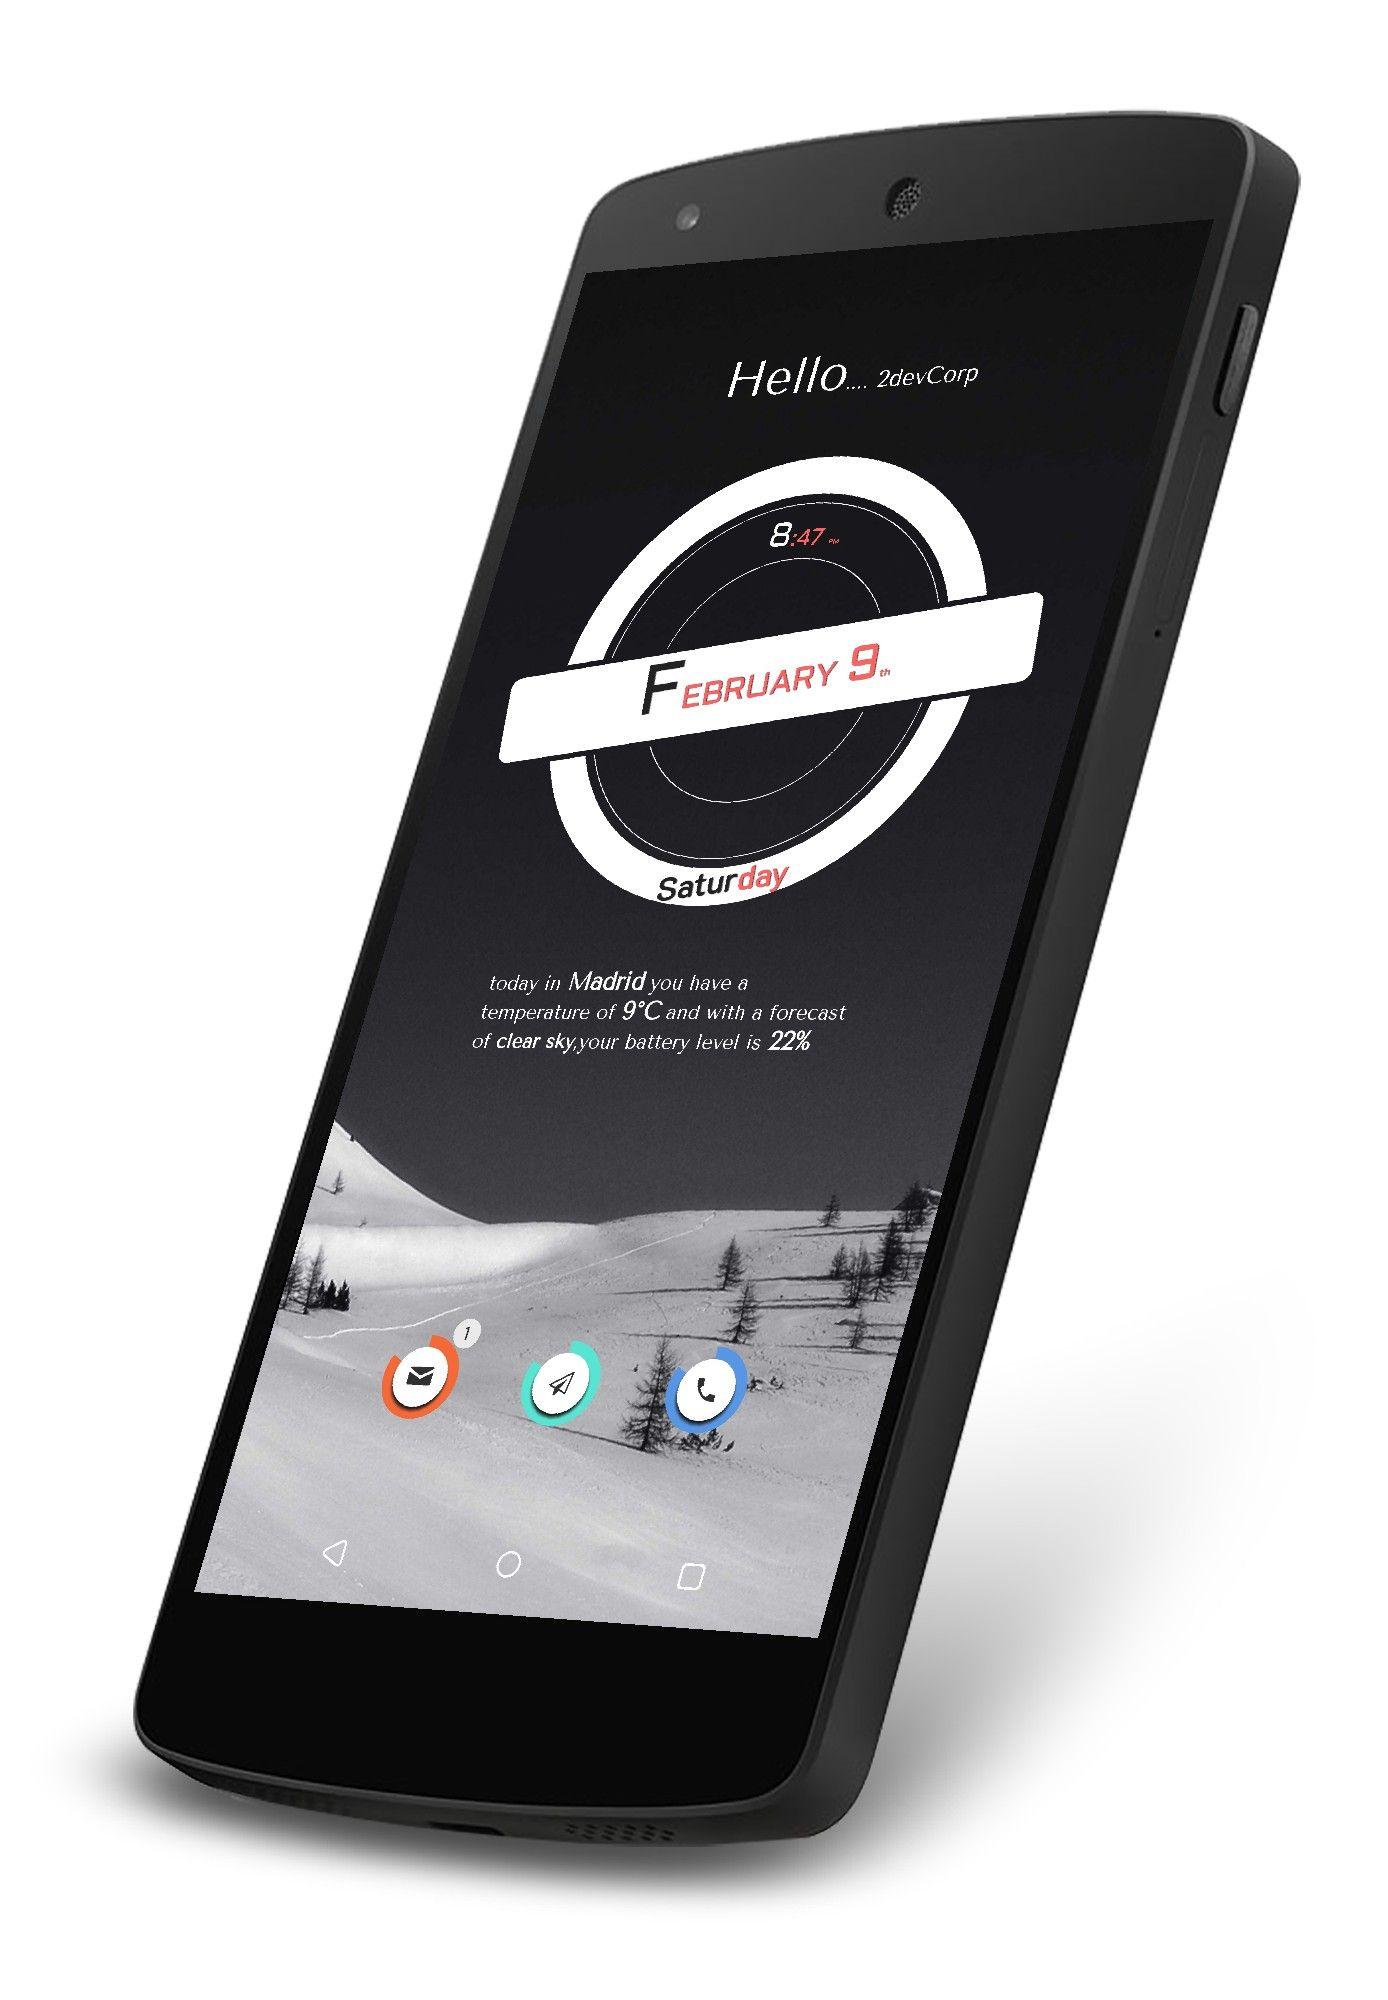 Kwgt Widgets Dyi phone case, Phone accessories, Phone